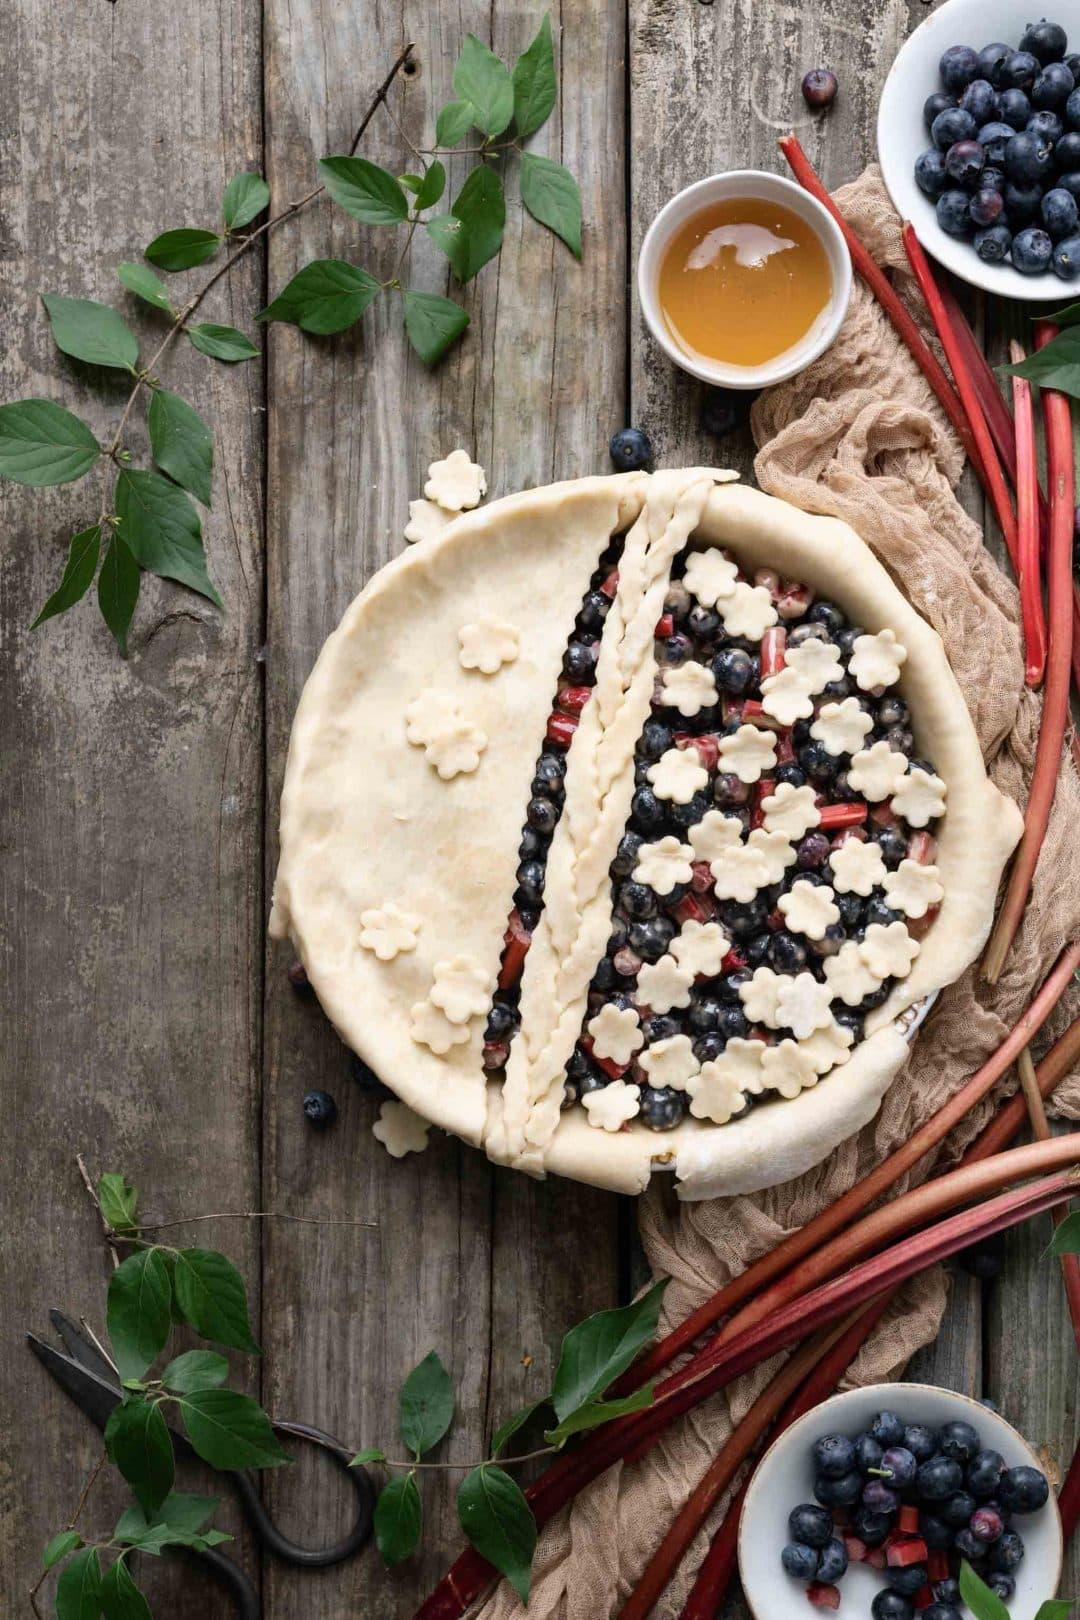 Blueberry Rhubarb pie with flower crust design